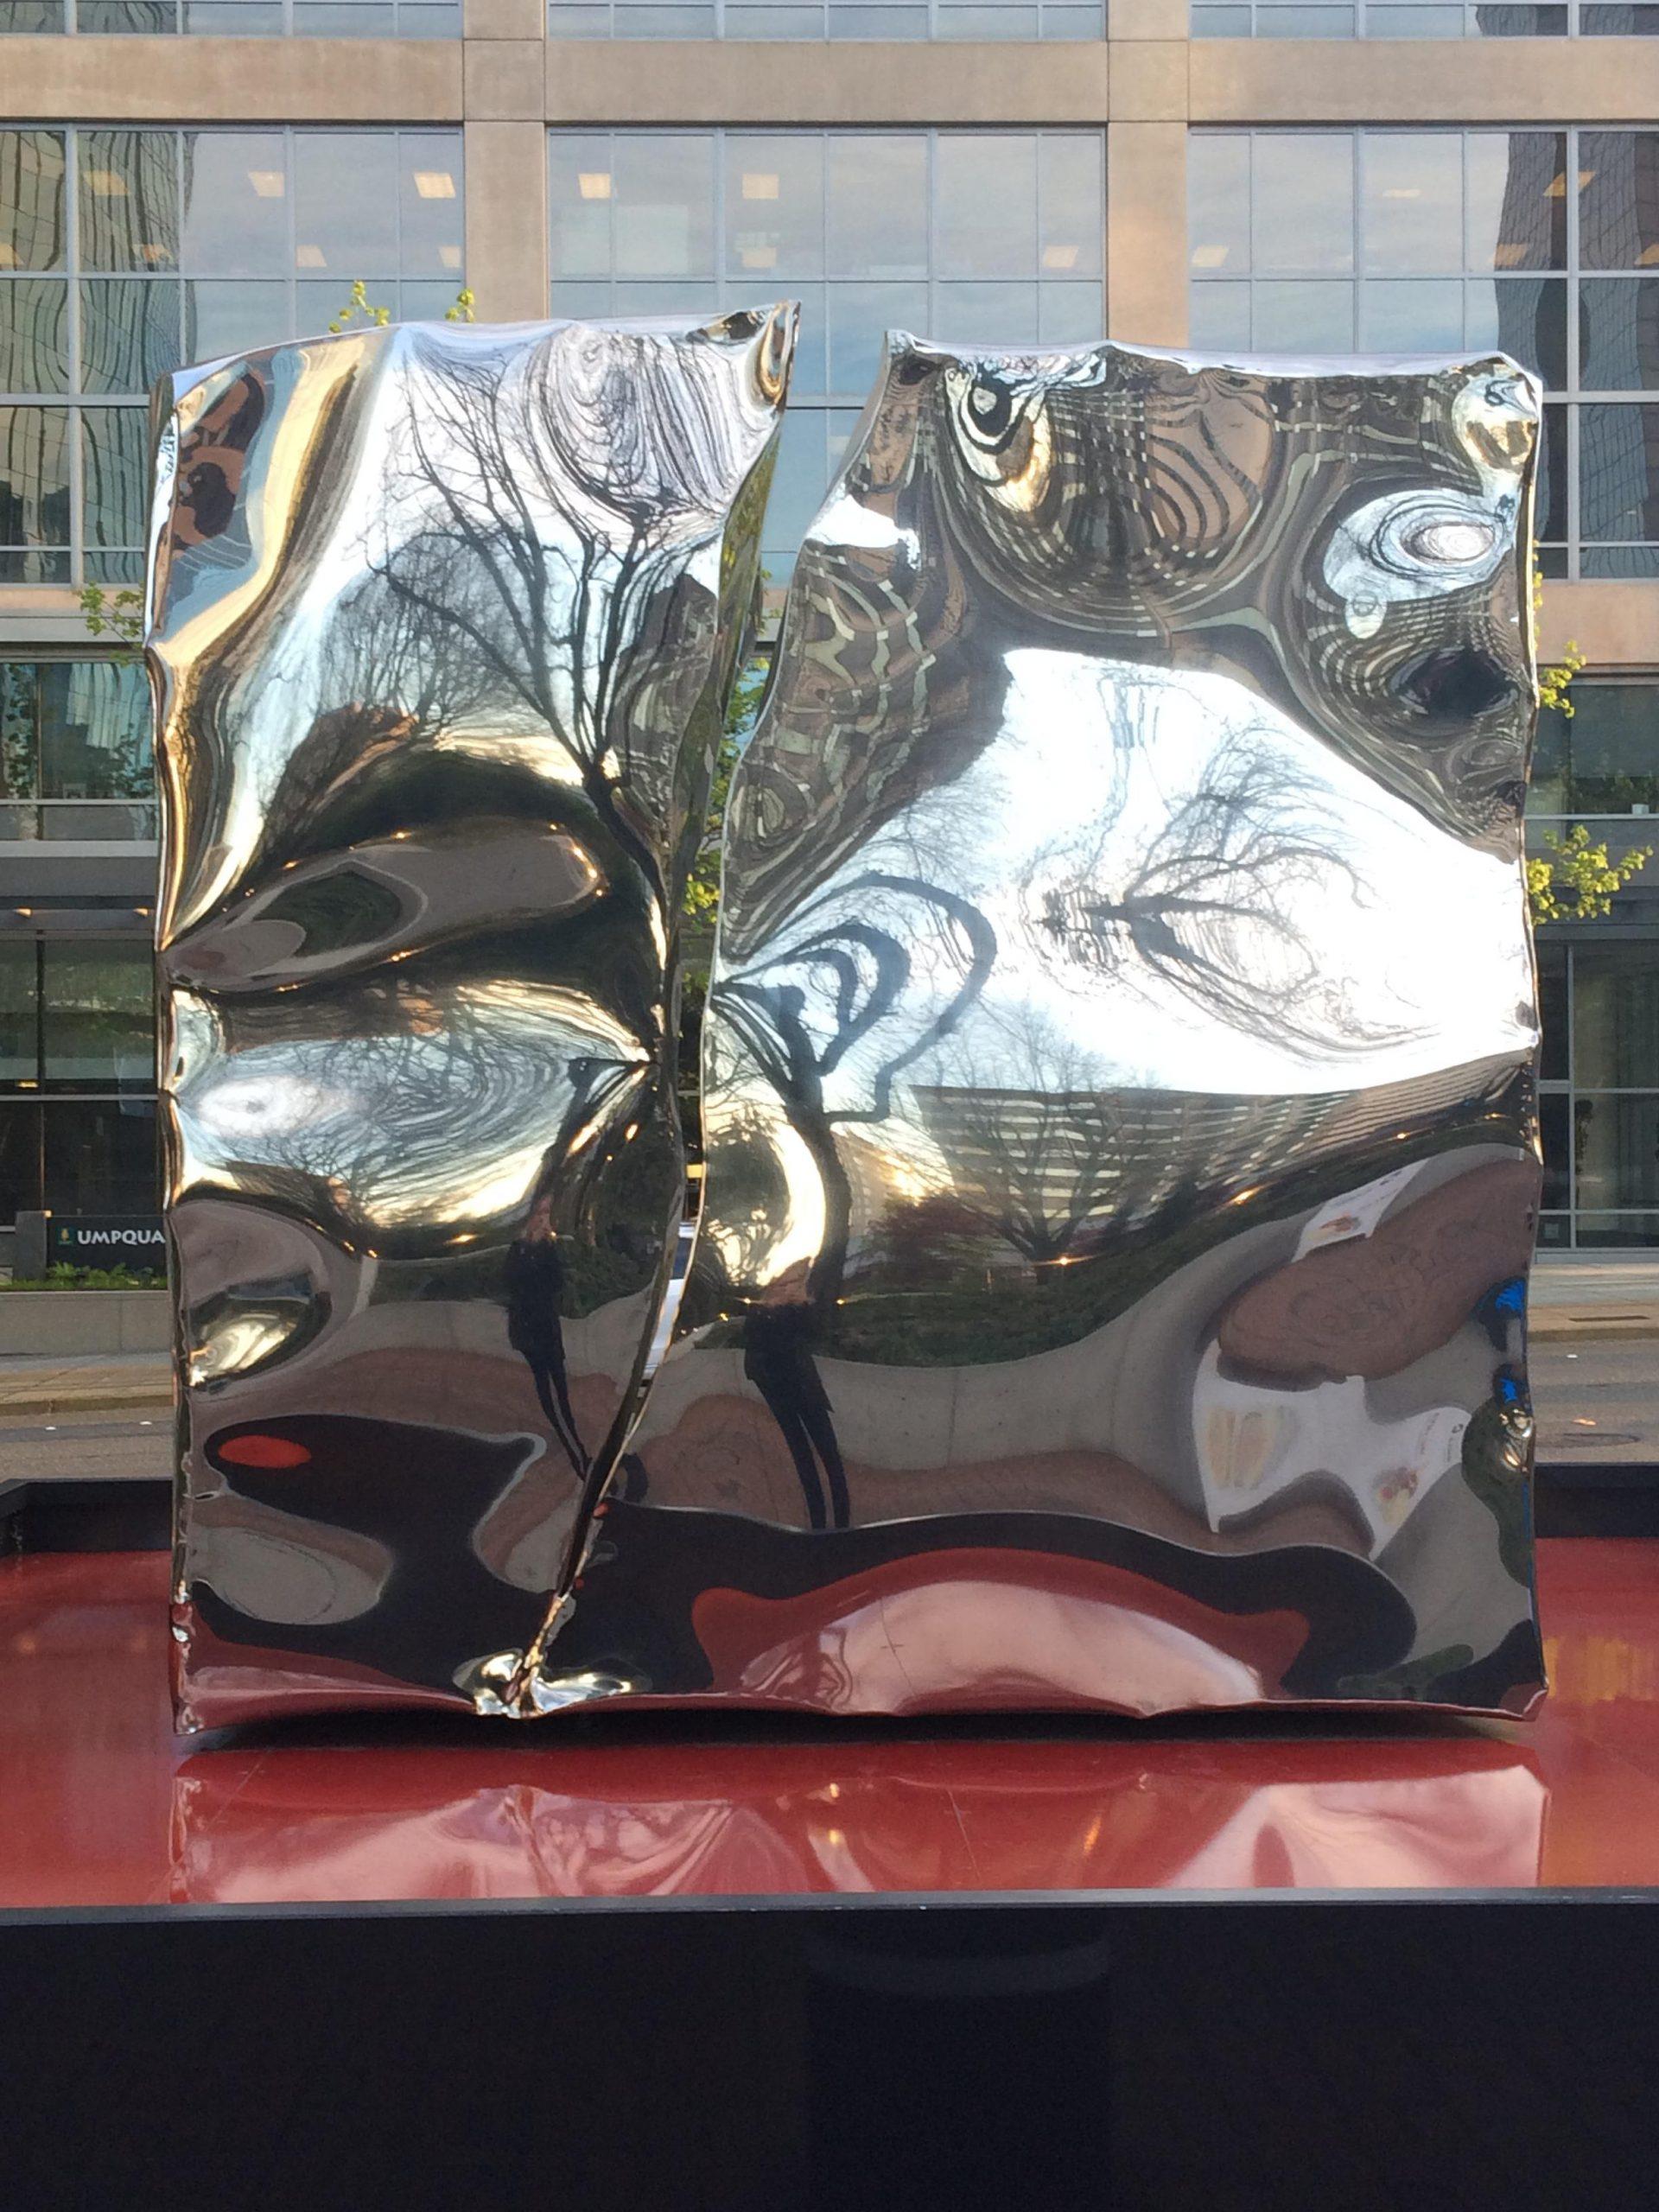 Kilroy on Ice (The Cube)